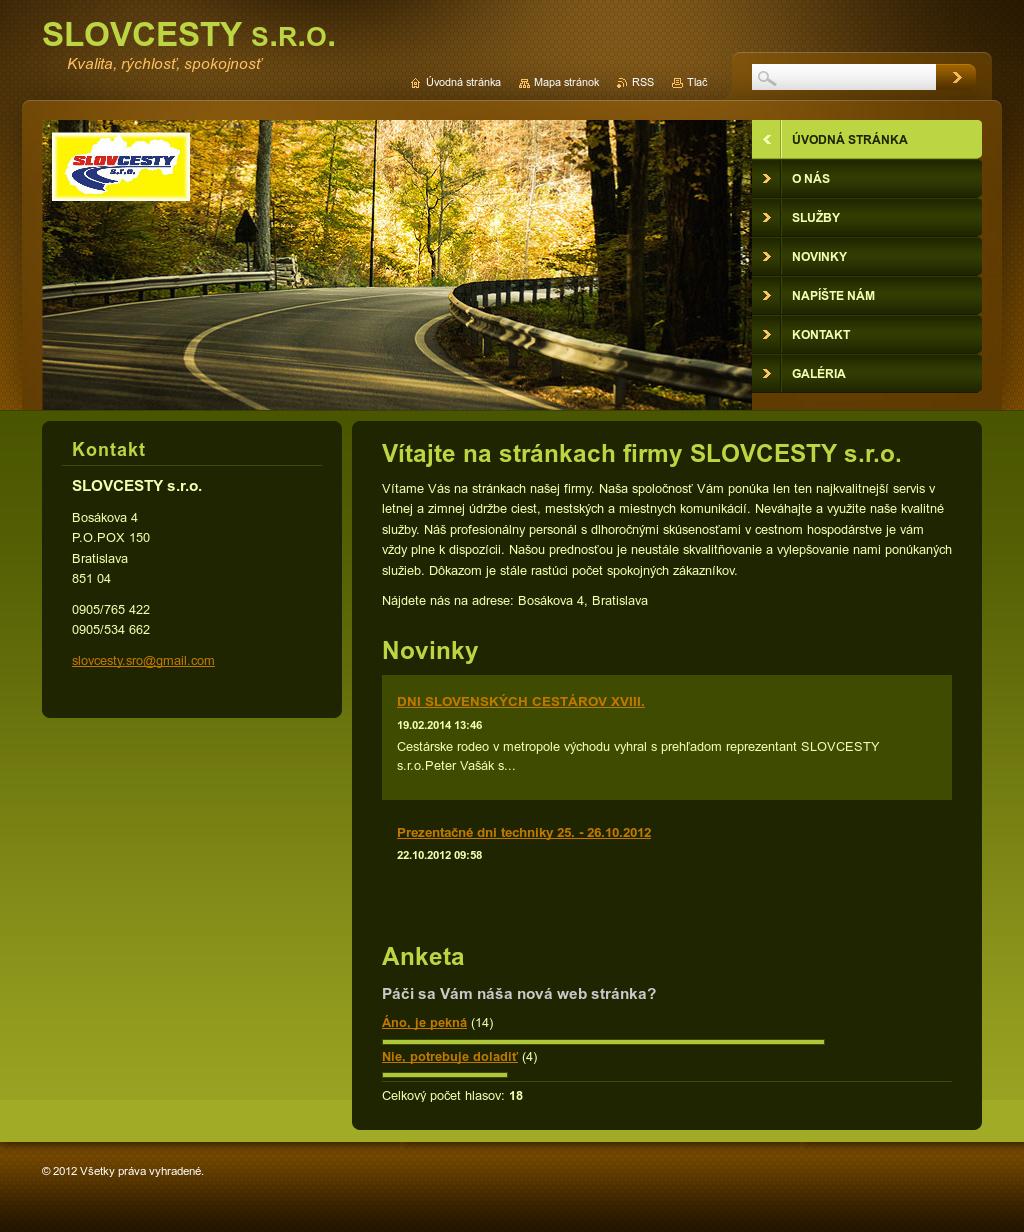 Cesty slovenskom online dating